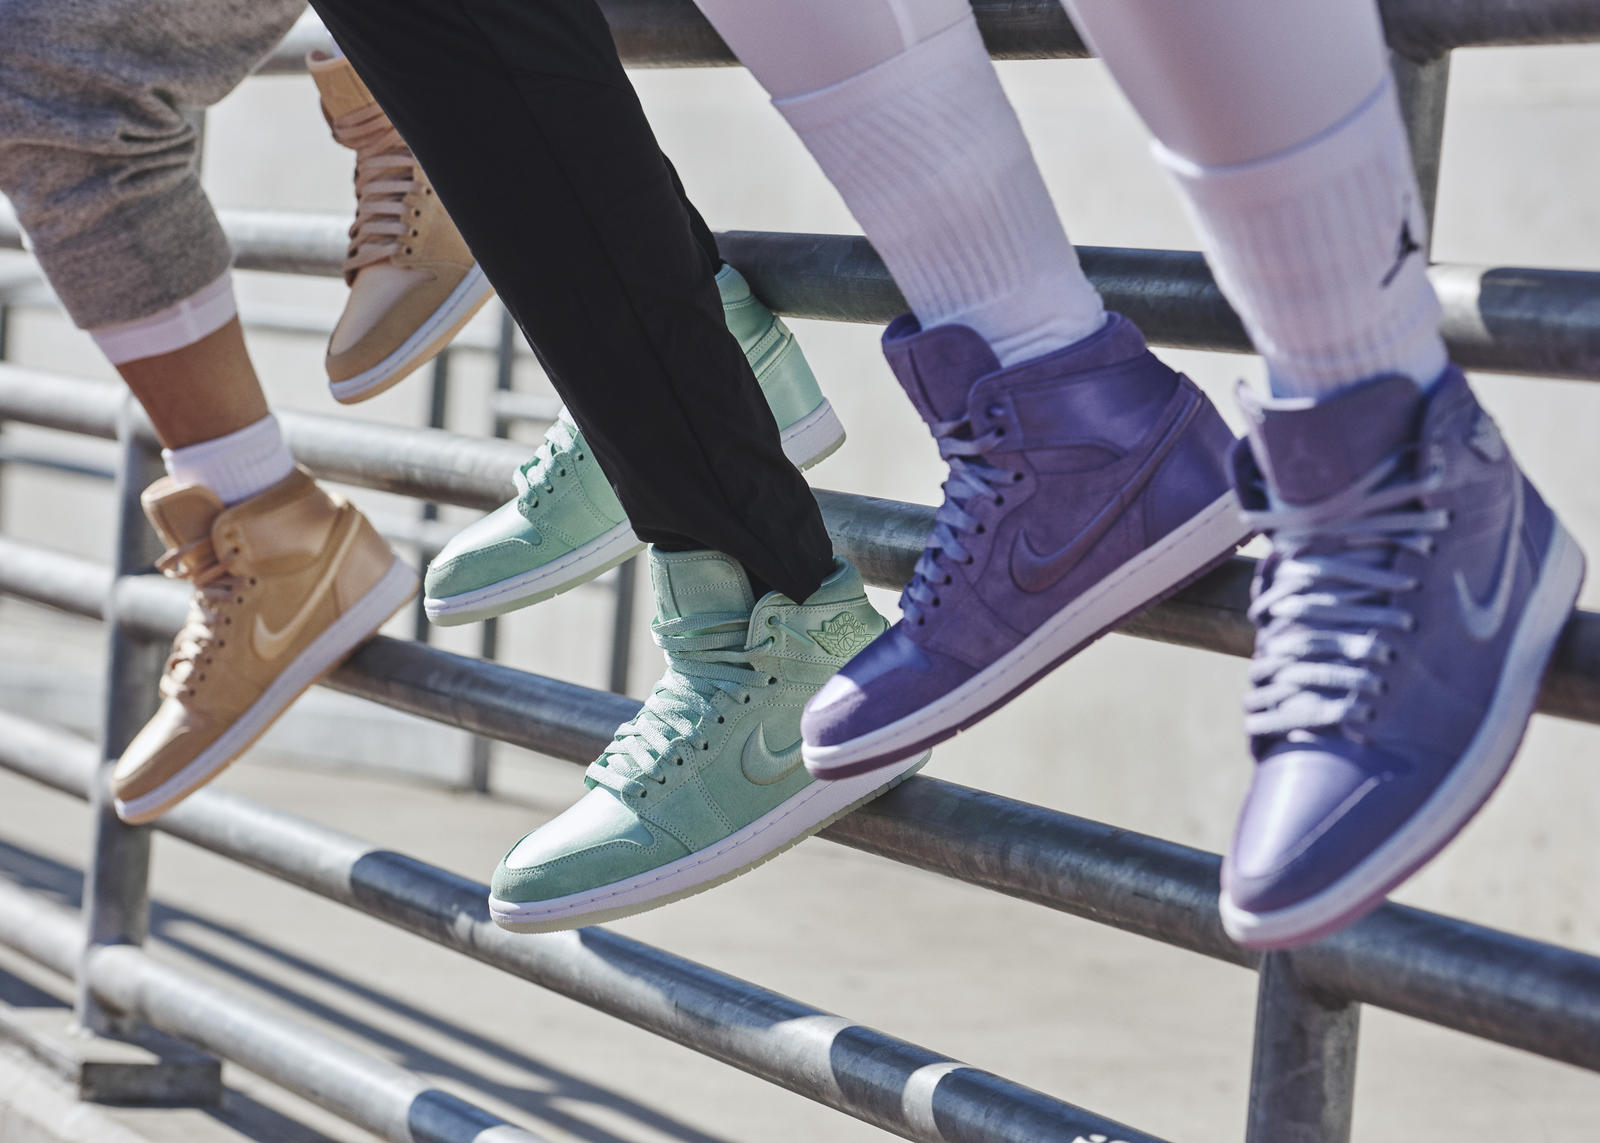 Jordan Brand Reveals Spring 2018 Women's Collection - Nike News